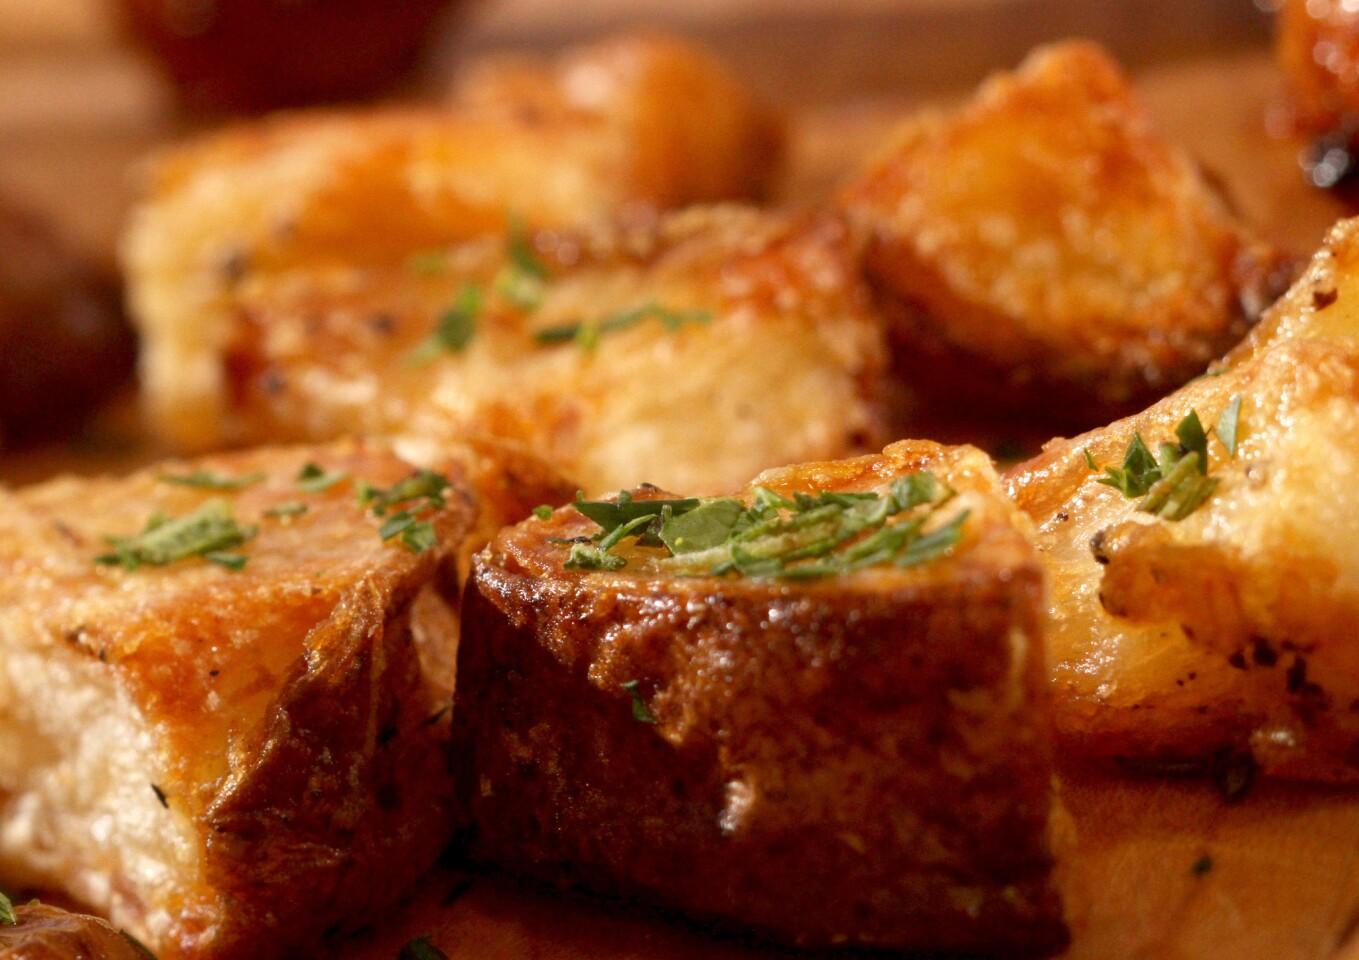 Super-crisp roasted potatoes. Get the recipe.